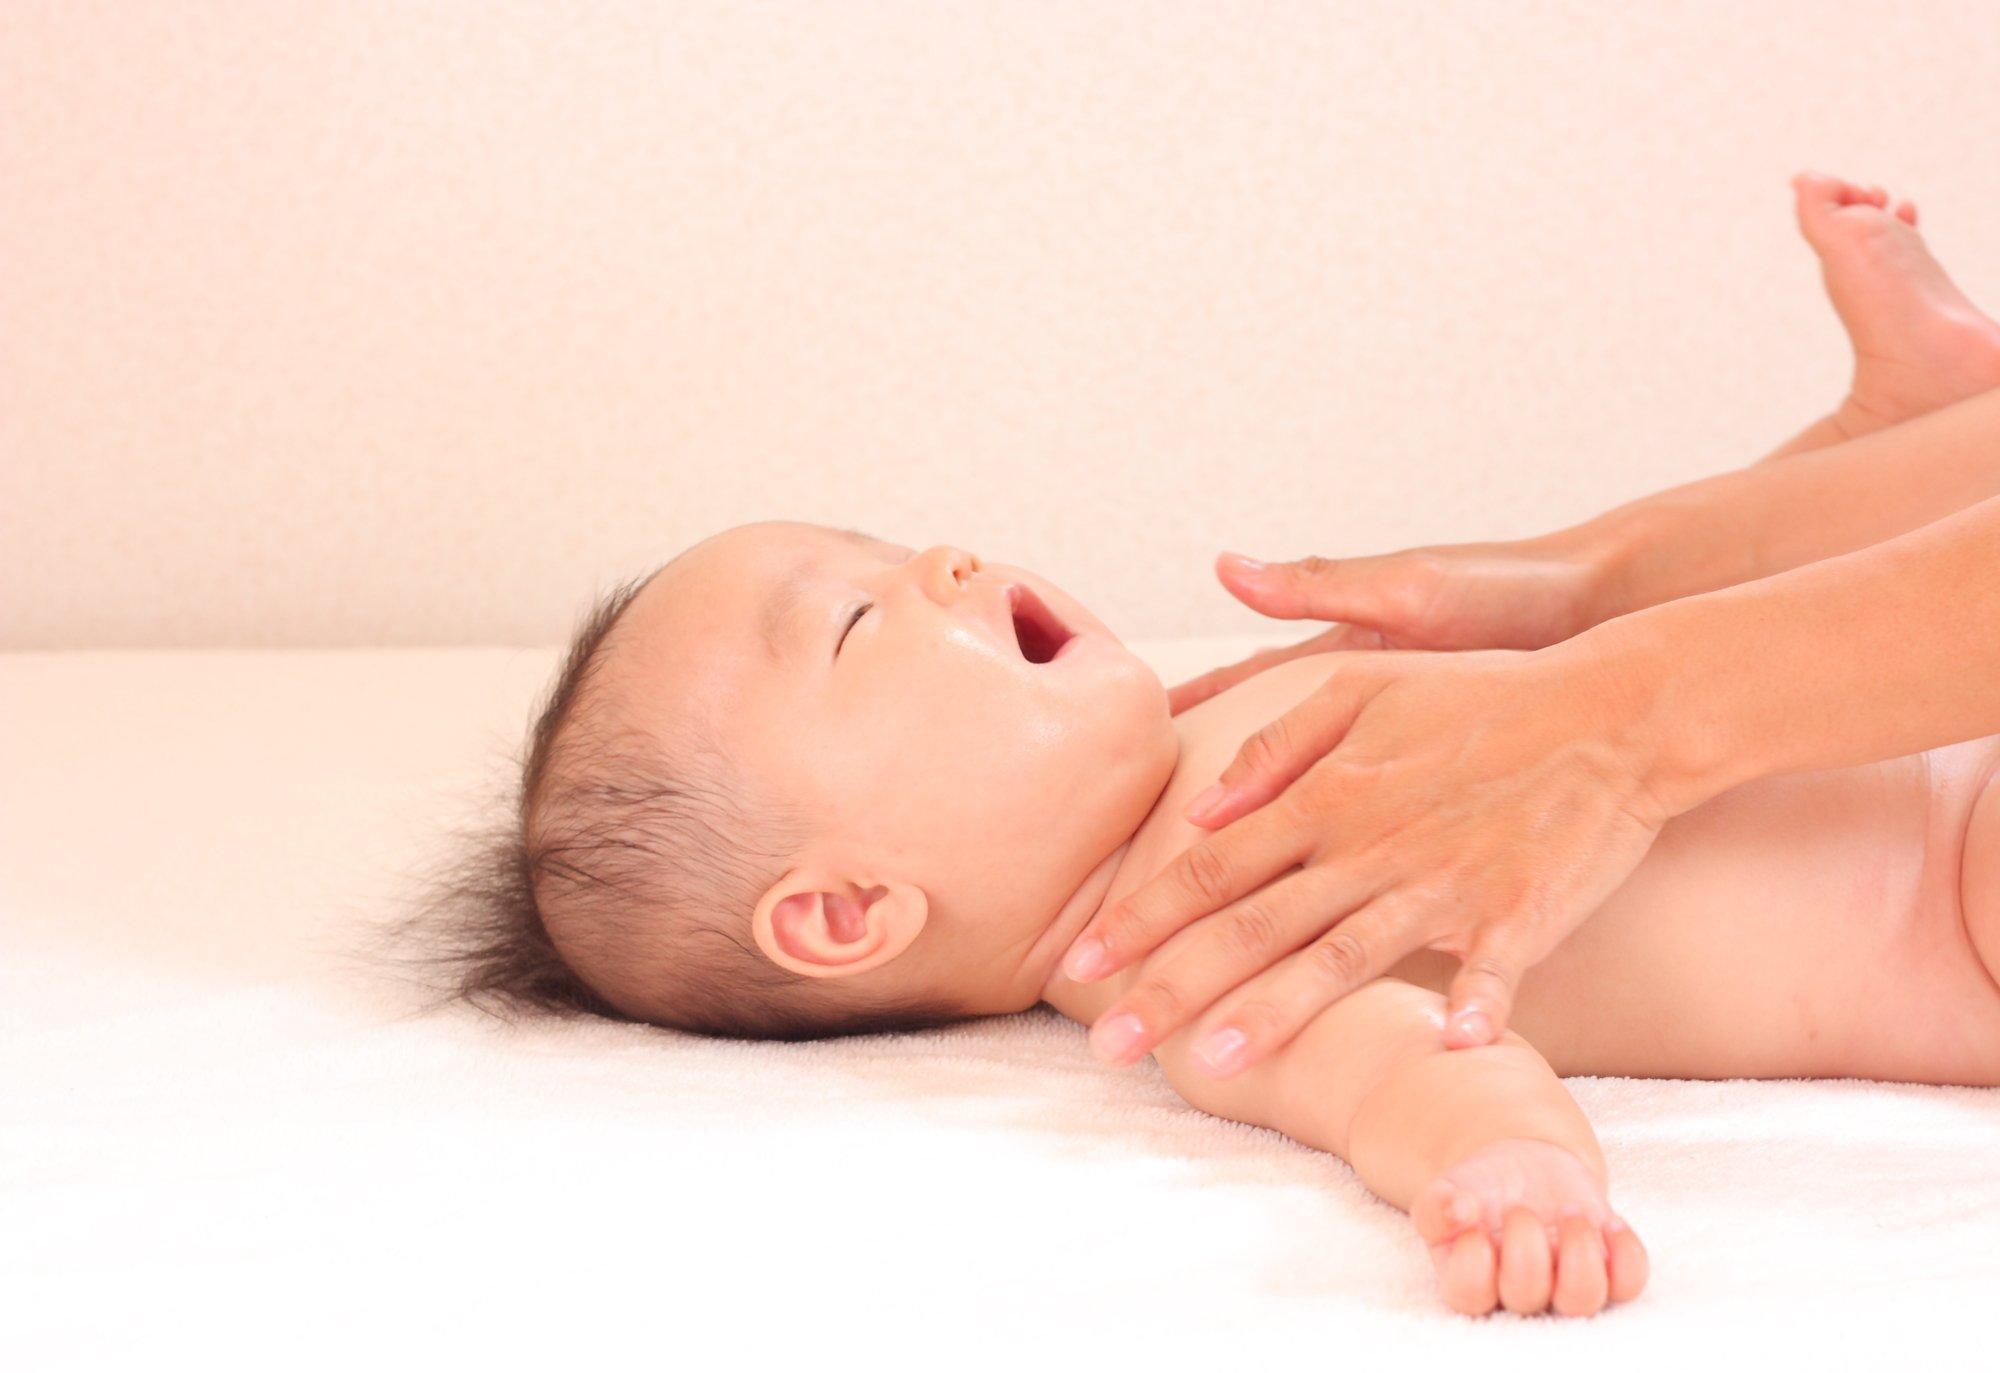 db057d87291db64681ace360f7ae859e.jpg?resize=1200,630 - 睡眠中に命を落とす危険も!乳幼児突然死症候群の原因と前兆